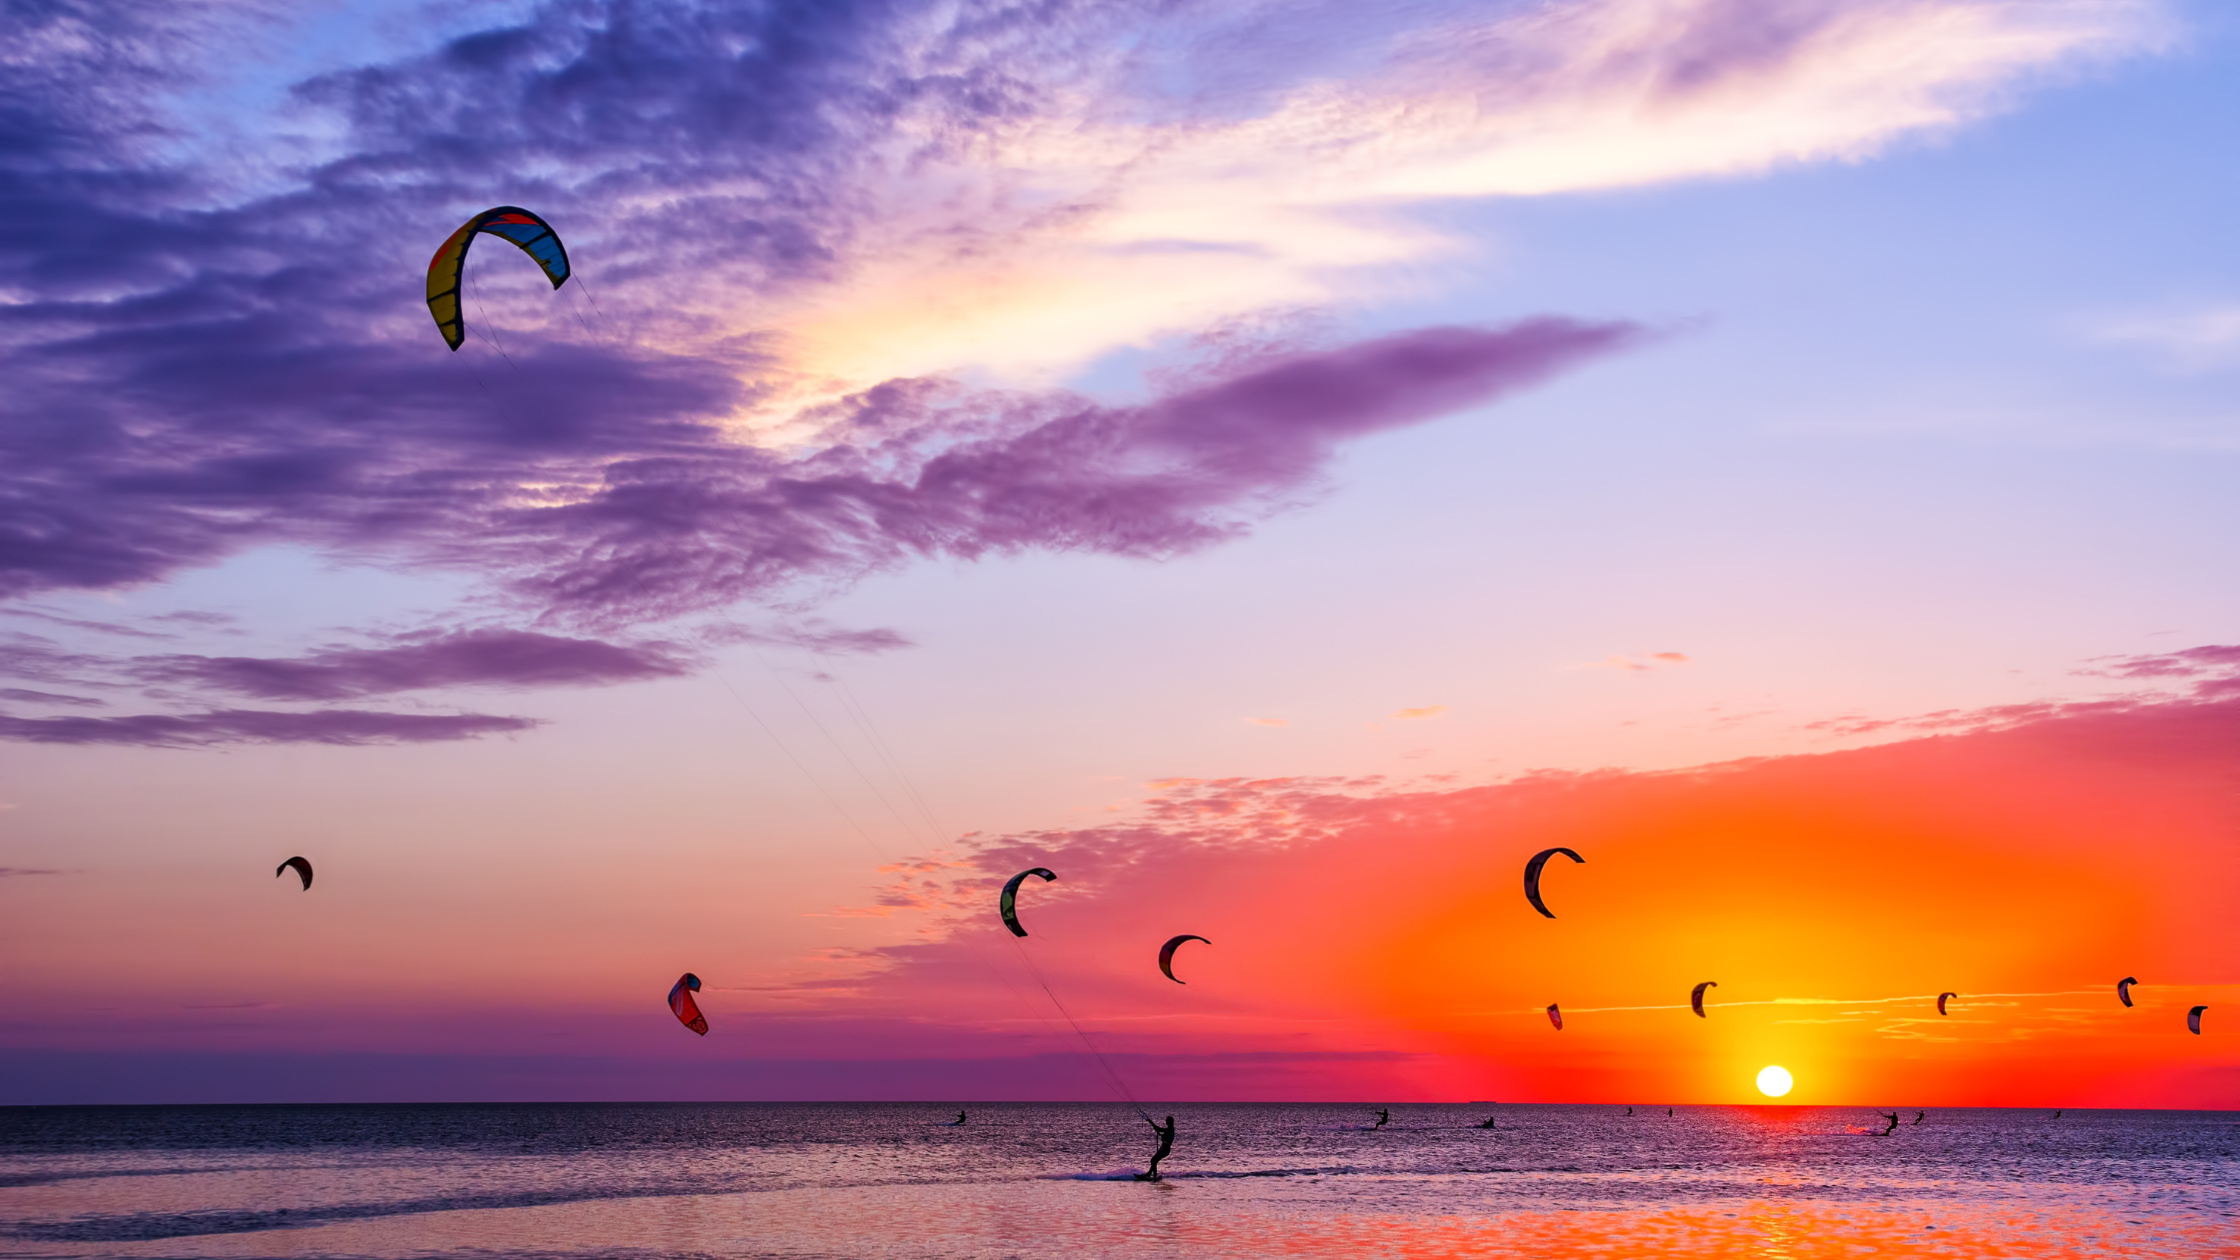 Kite surfing at sunset on Terschelling